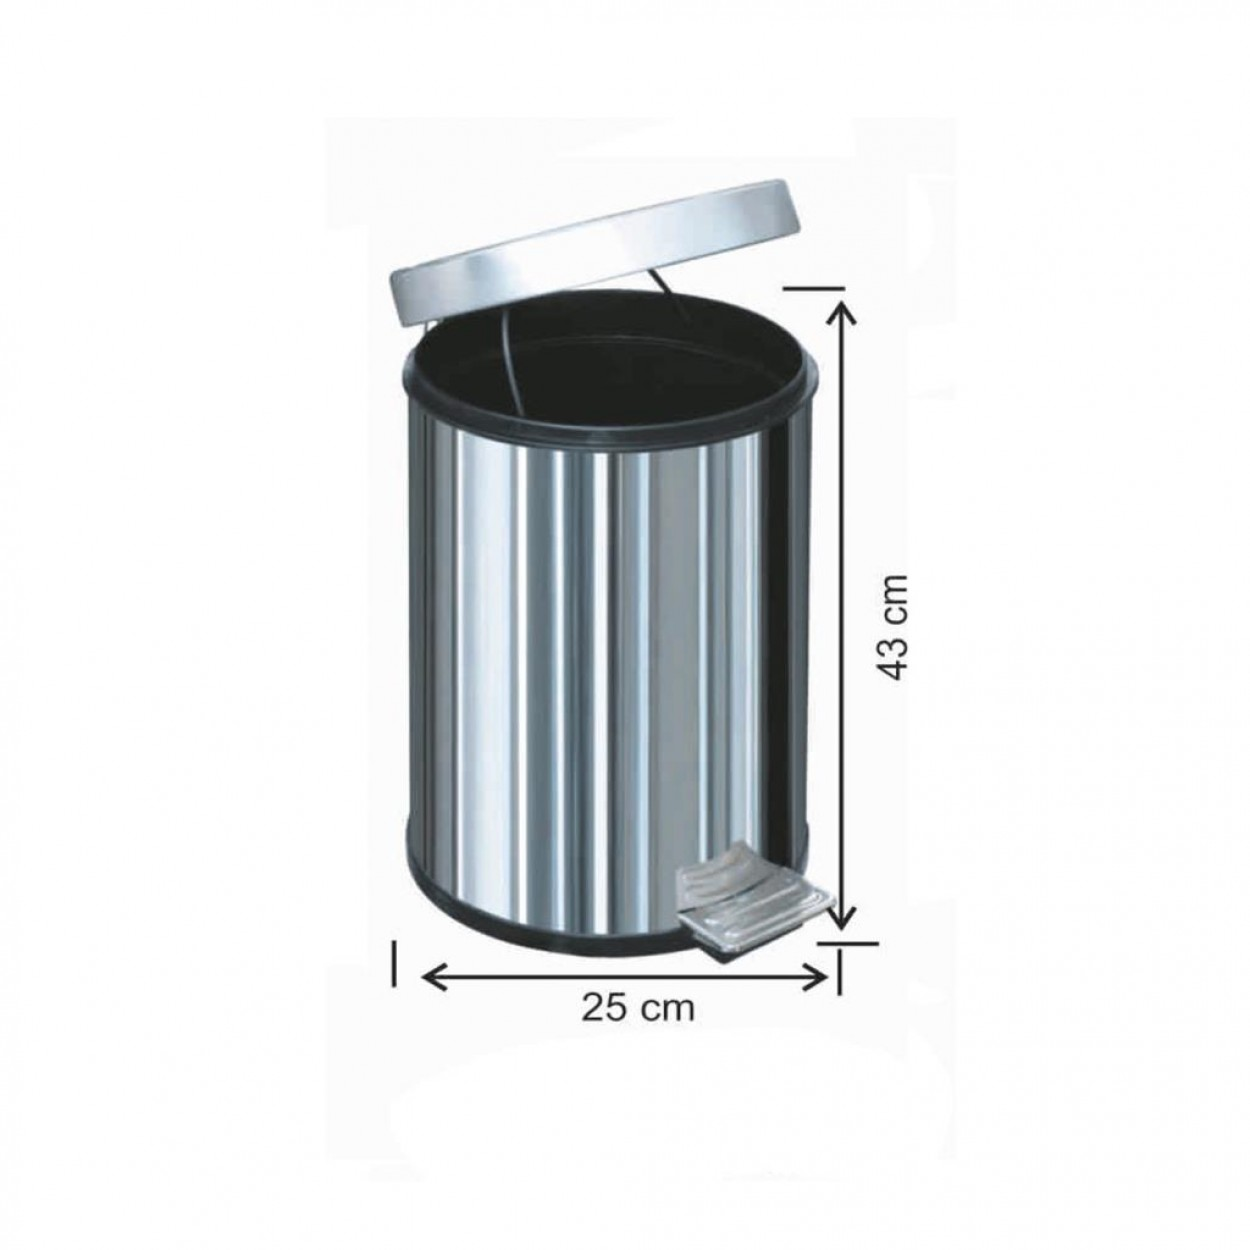 Pedallı Çöp Kovası 16 Litre